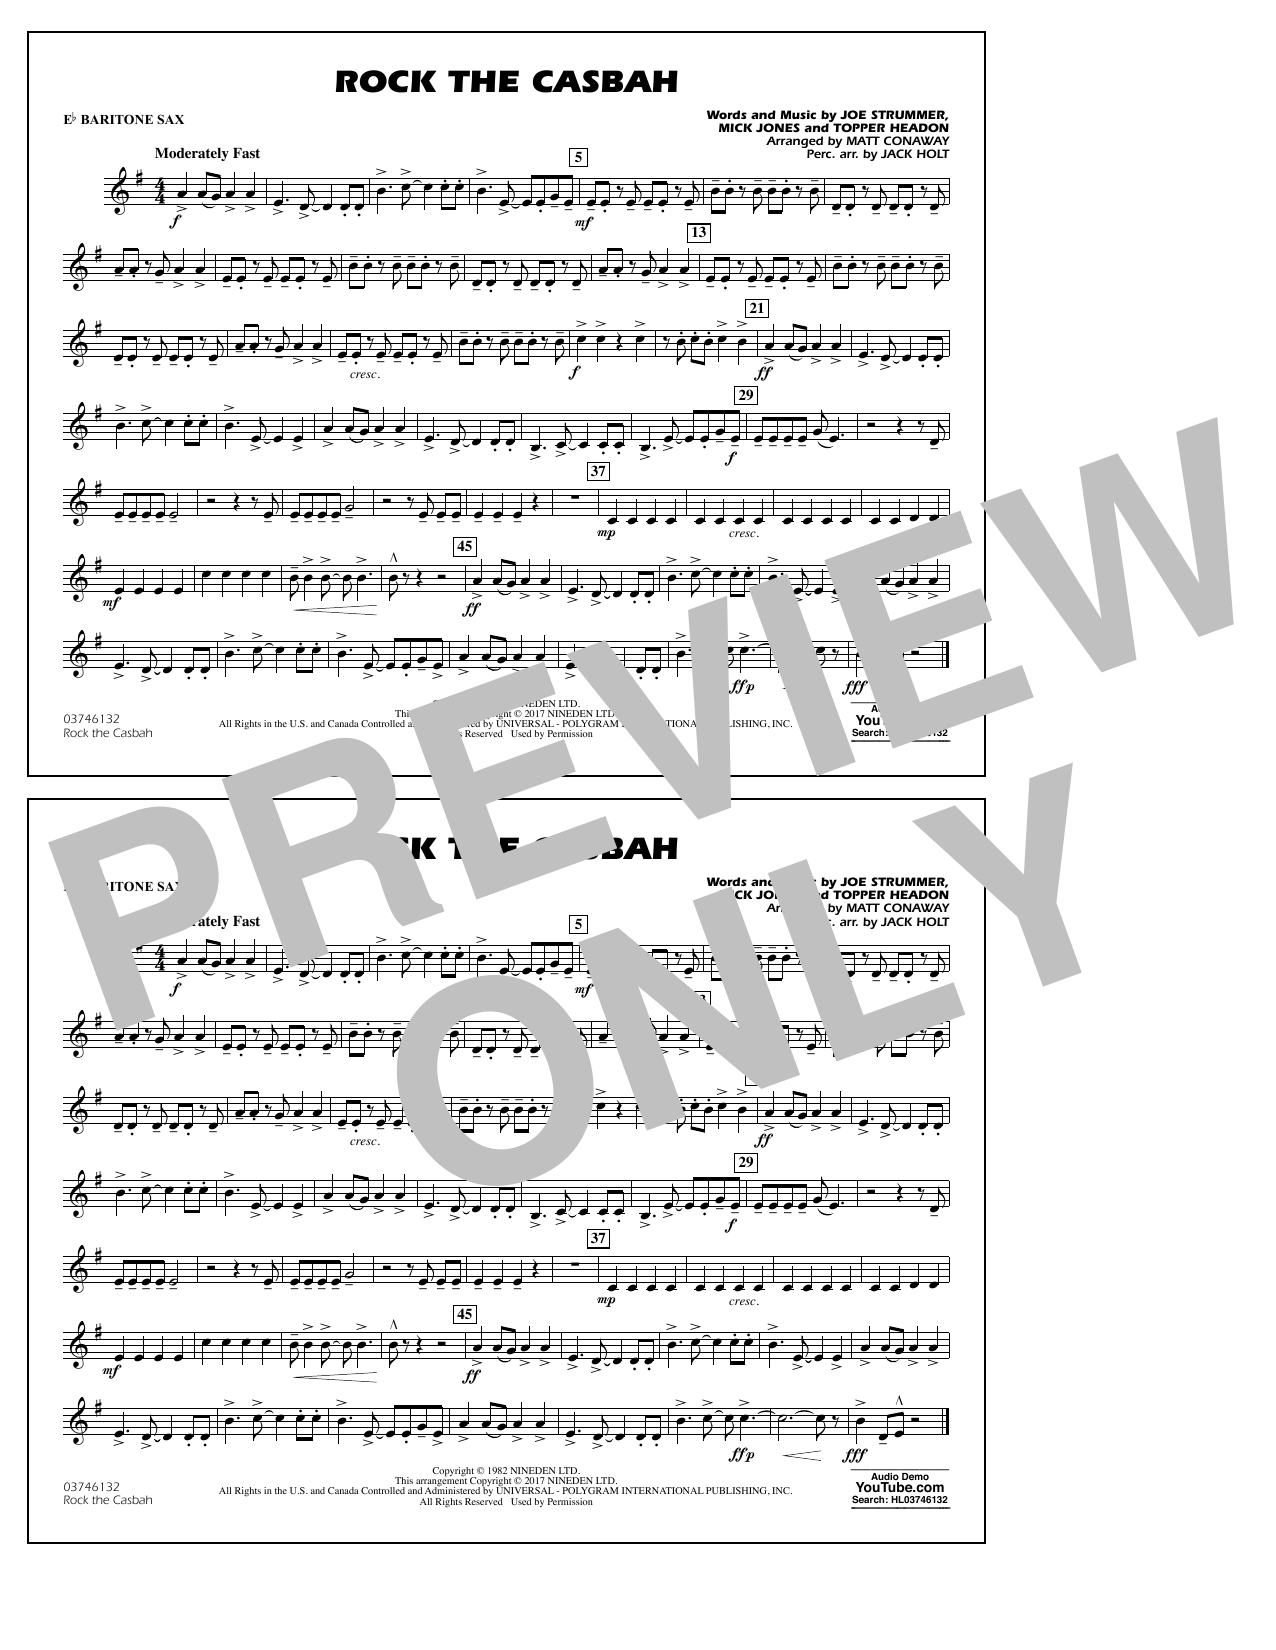 Rock the Casbah - Eb Baritone Sax Sheet Music